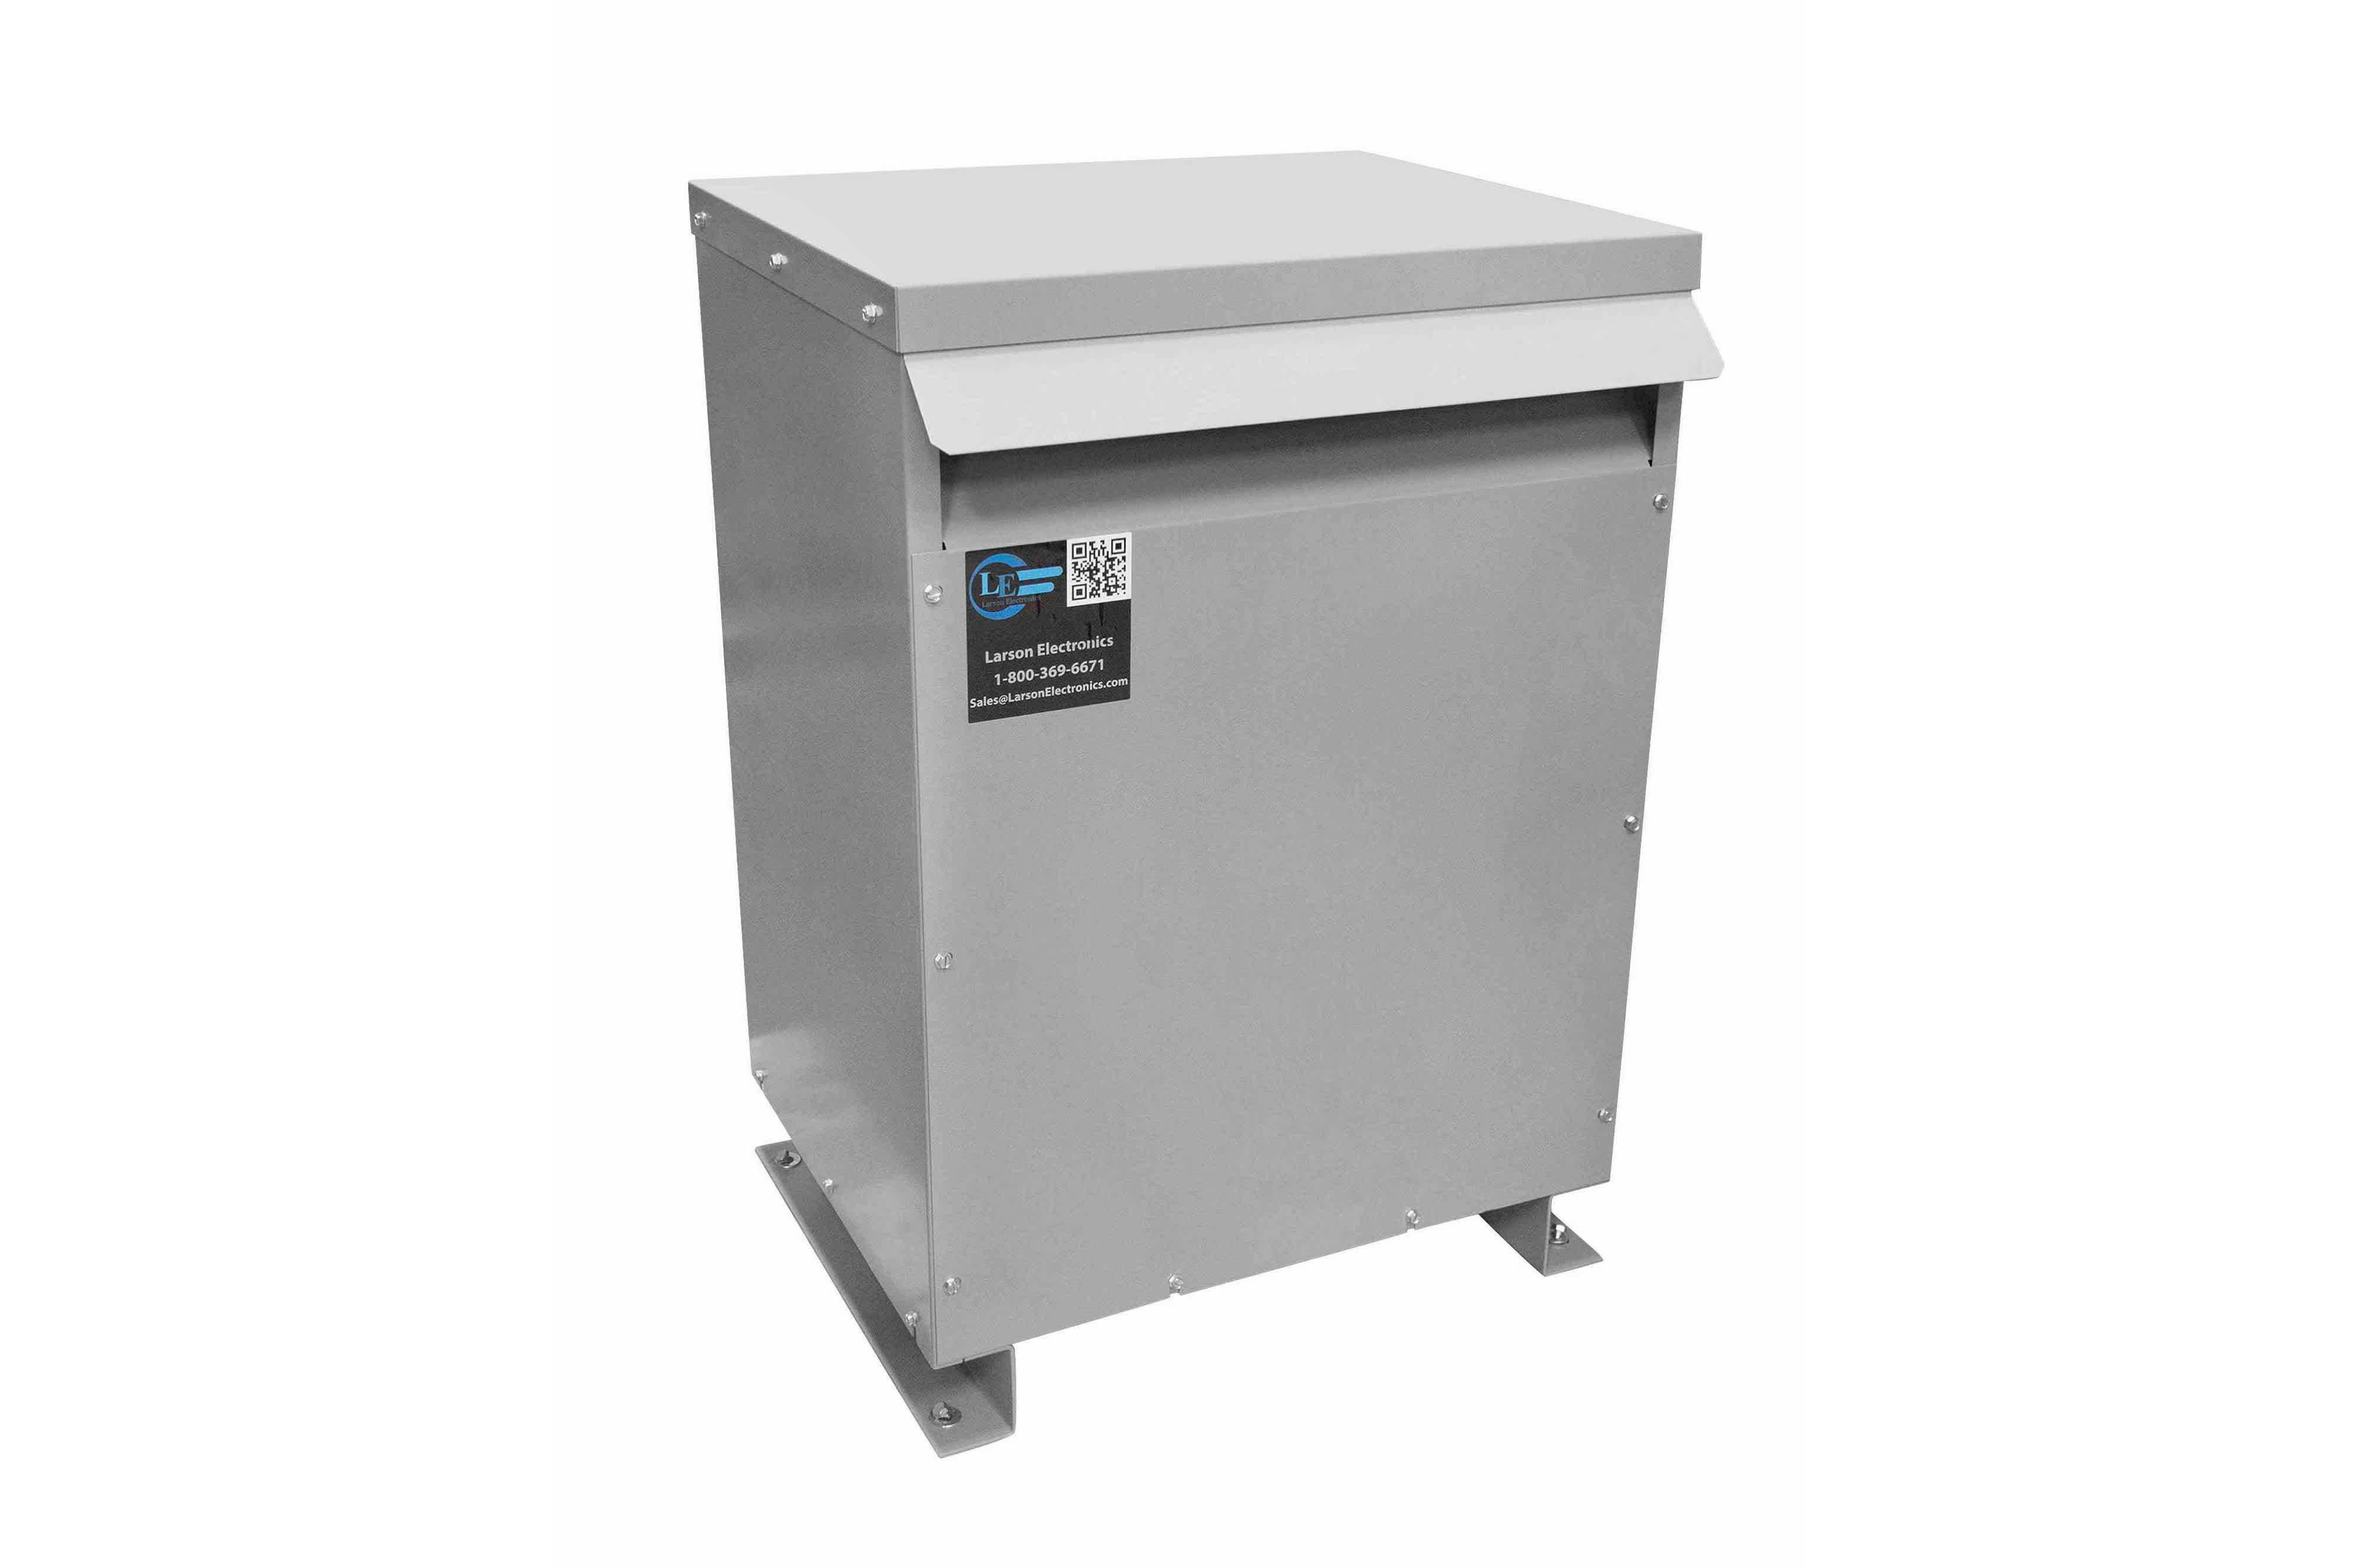 90 kVA 3PH Isolation Transformer, 240V Wye Primary, 415Y/240 Wye-N Secondary, N3R, Ventilated, 60 Hz